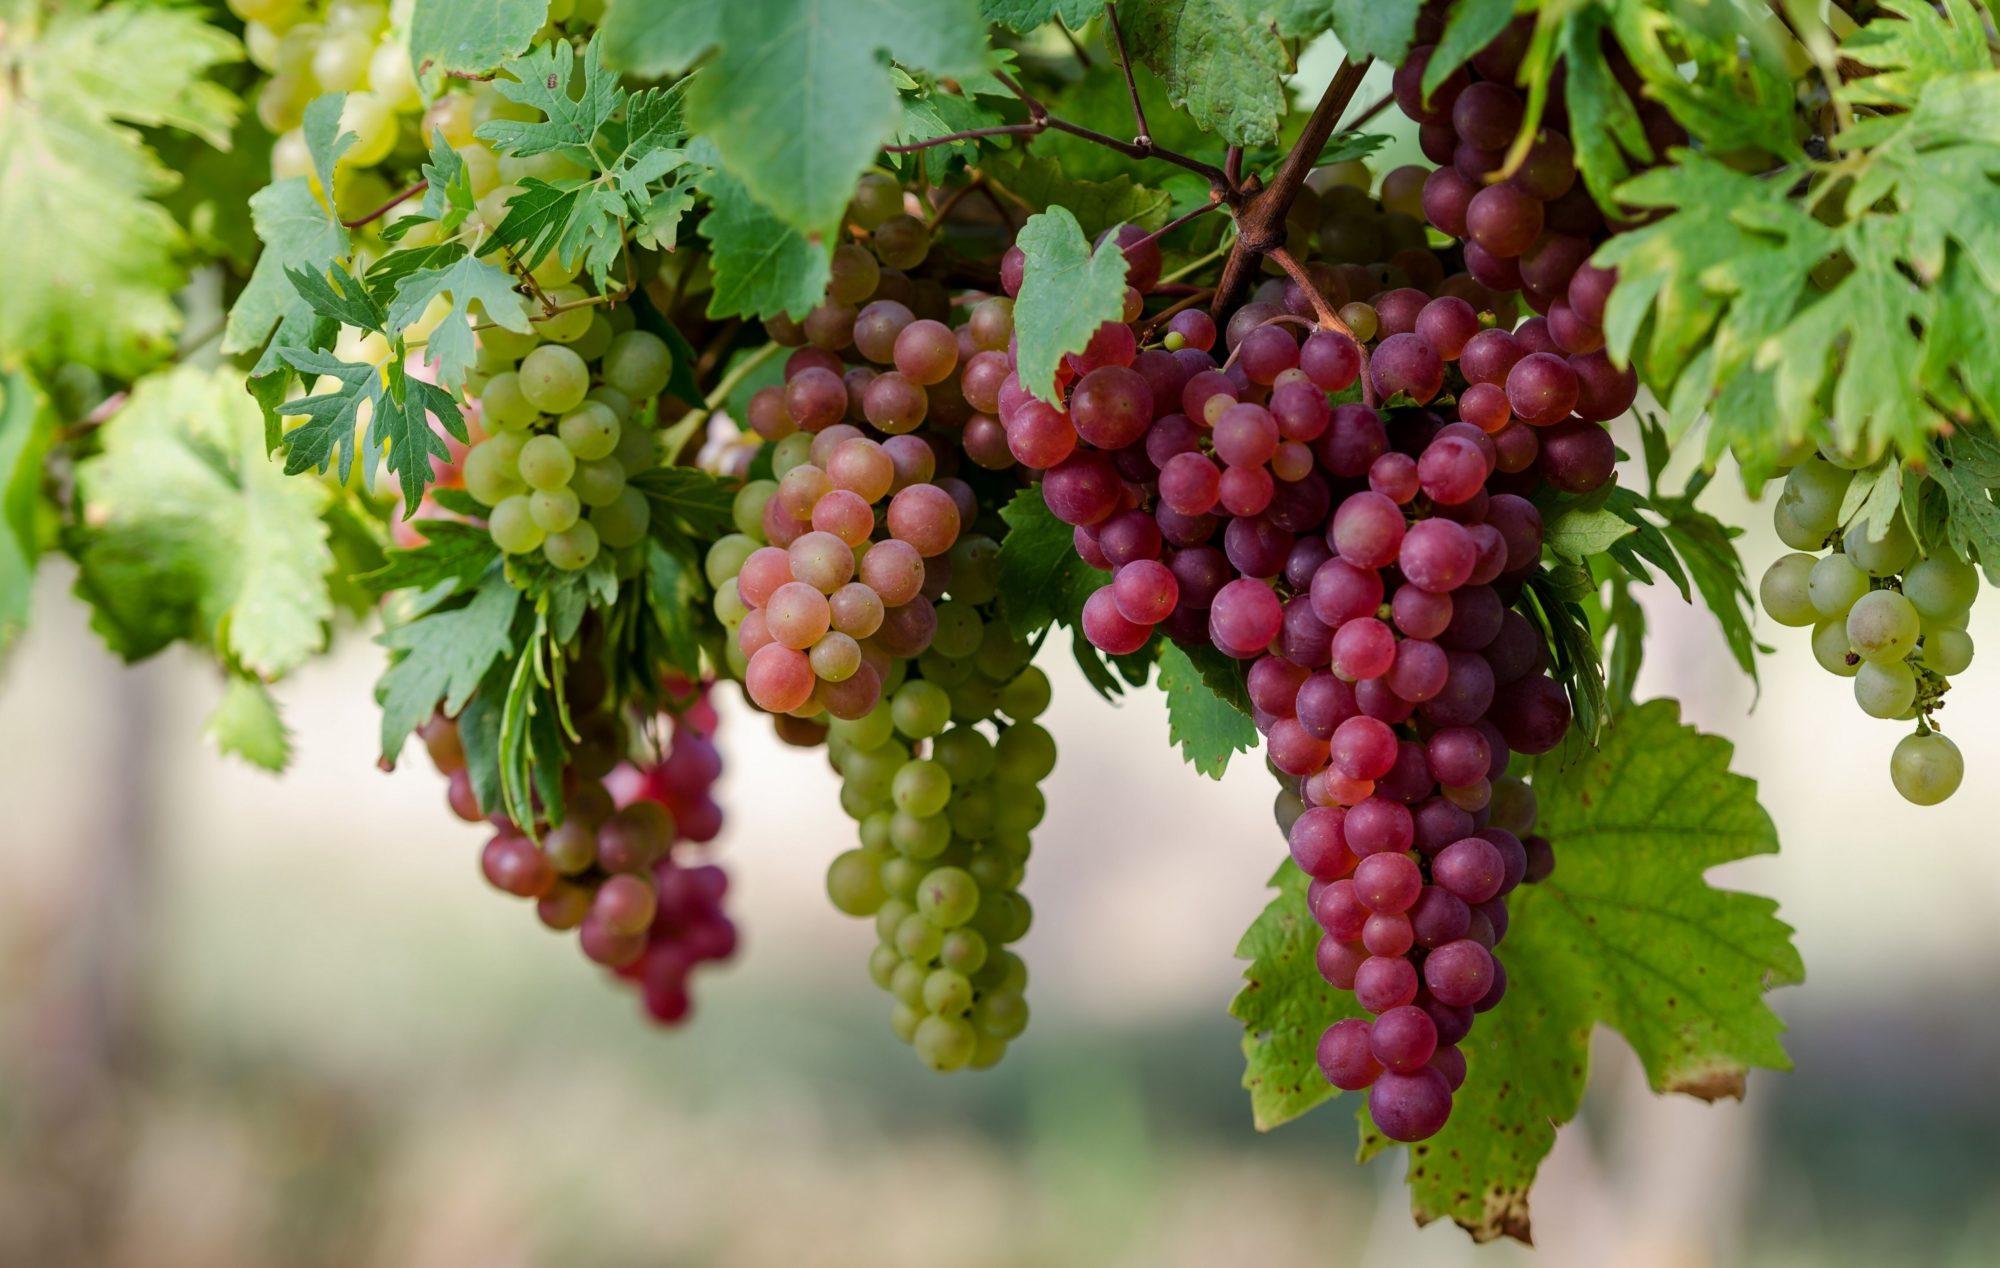 Вчені створили сорт винограду для Київщини - київщина, агросектор - vinograd 2000x1268